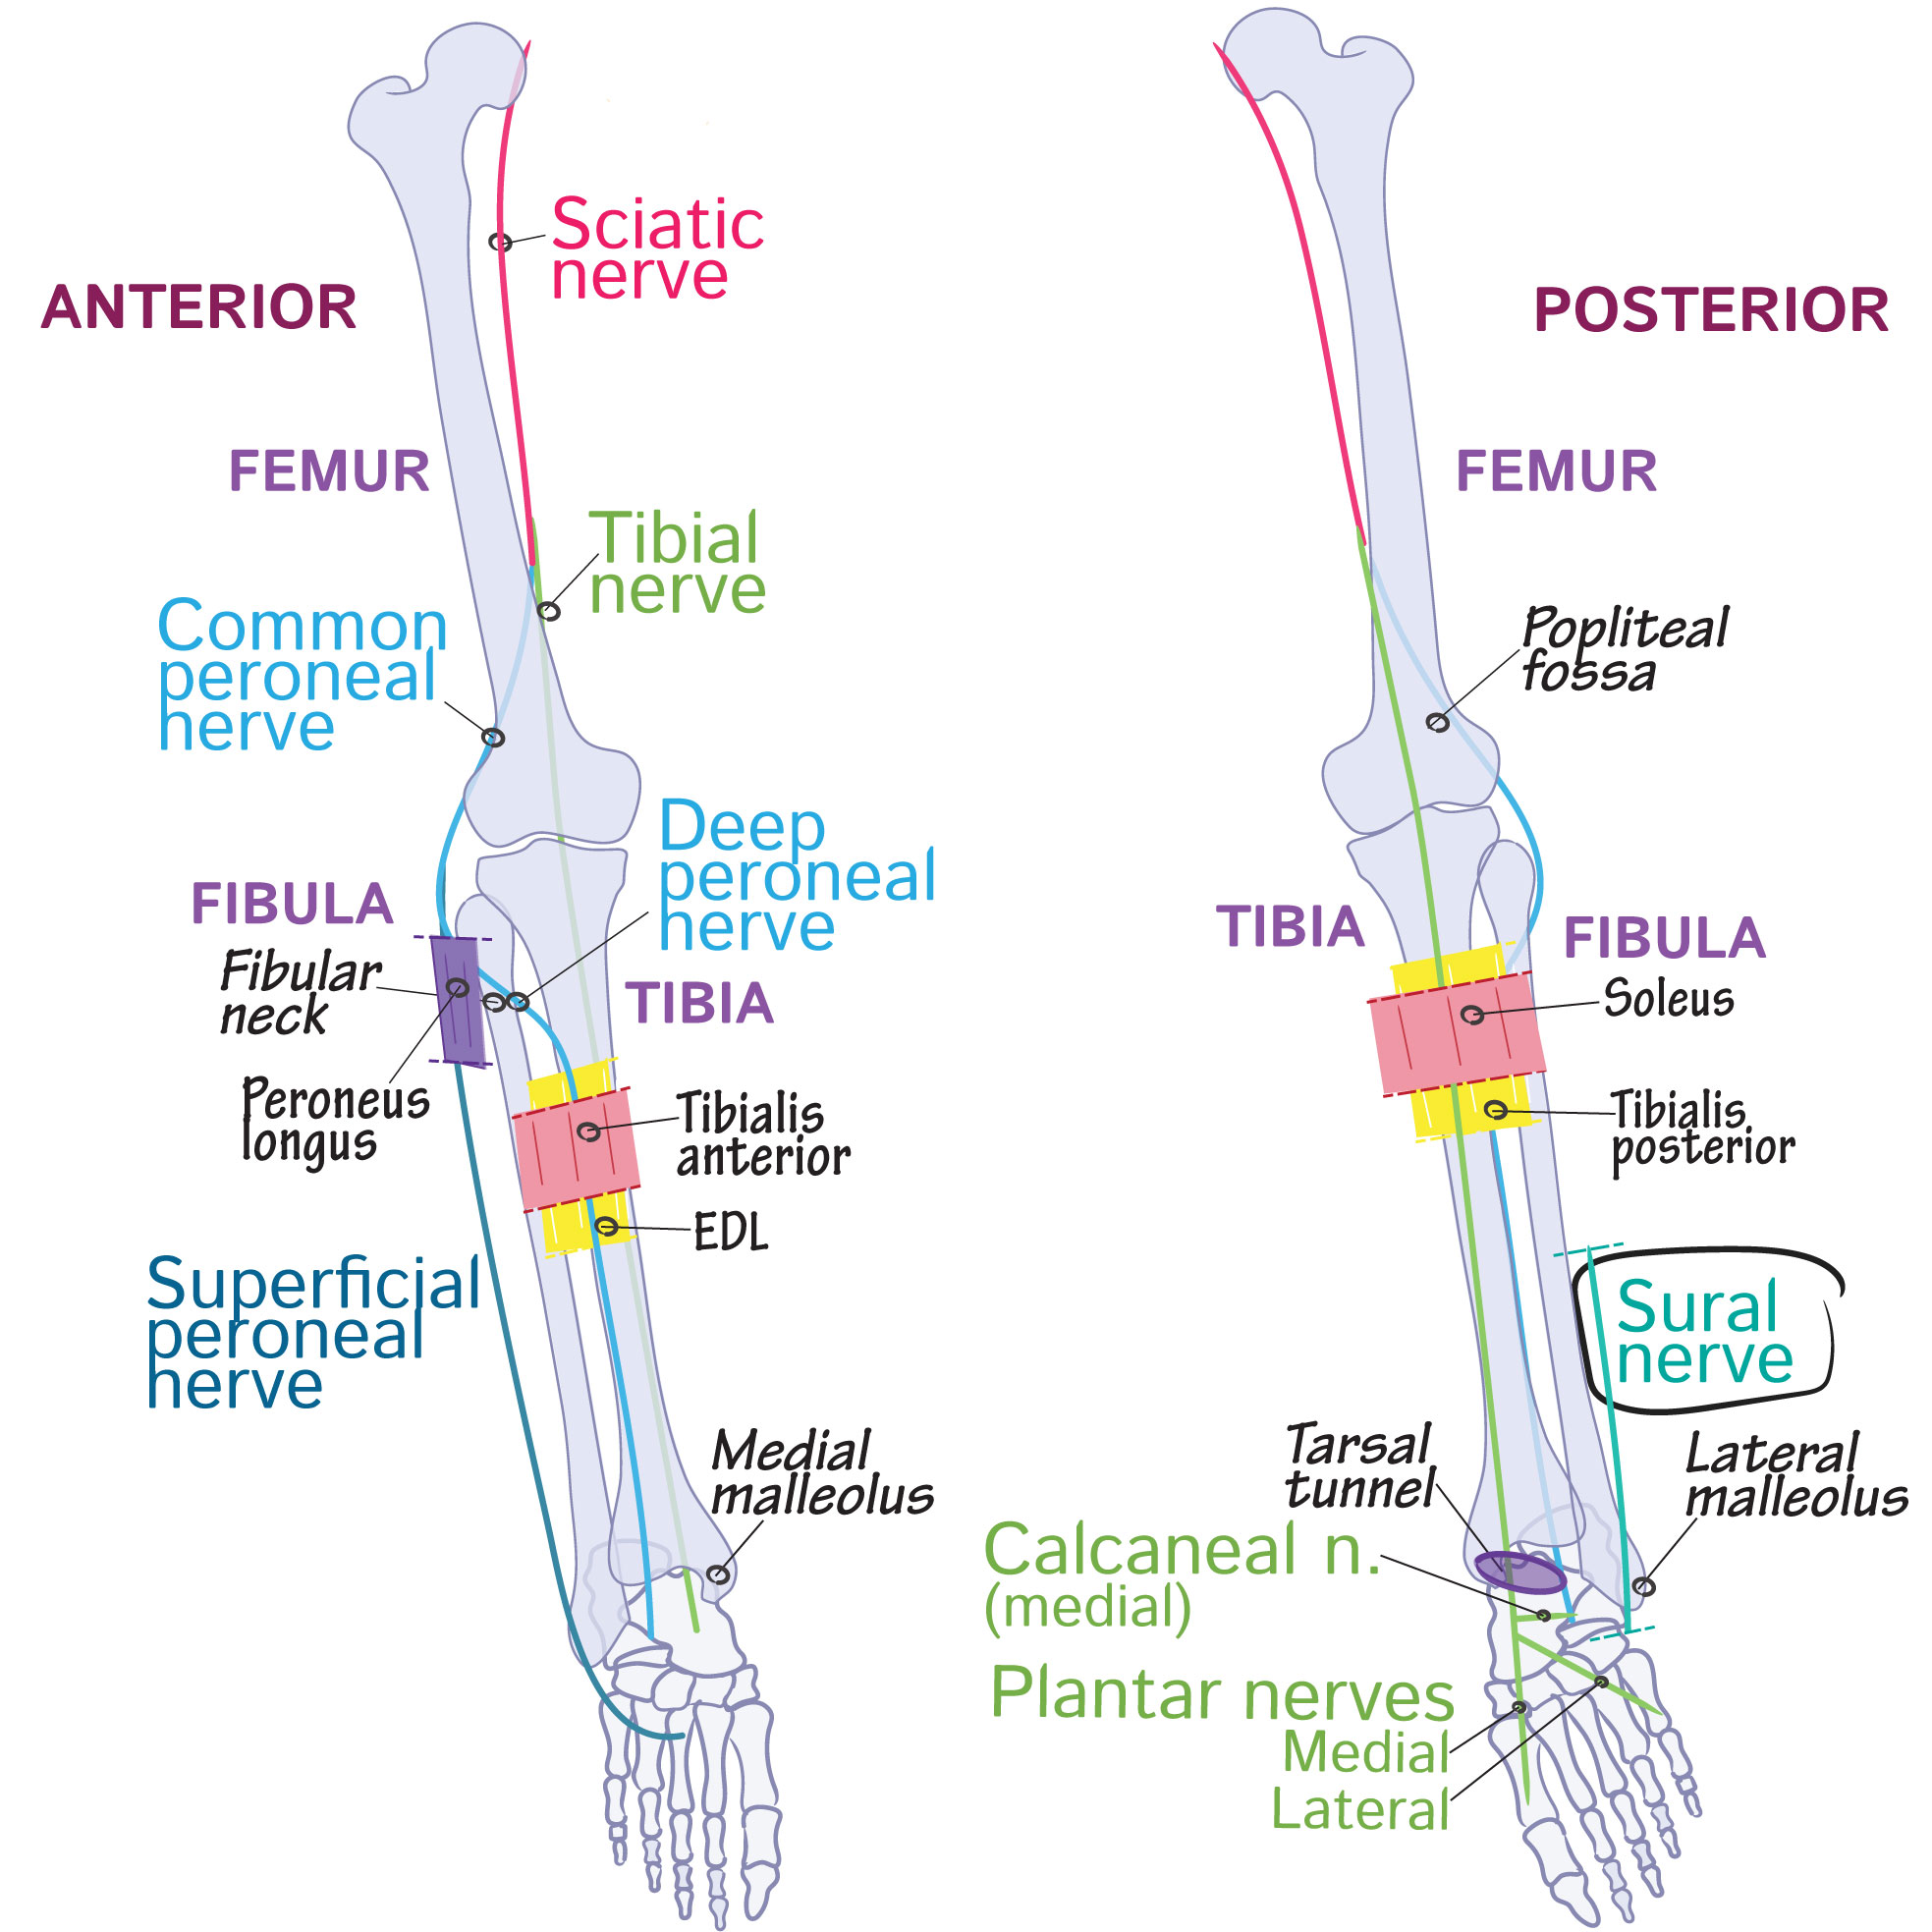 Gross Anatomy Glossary: Lower Limb - Sural Nerve (Cutaneous) | Draw ...